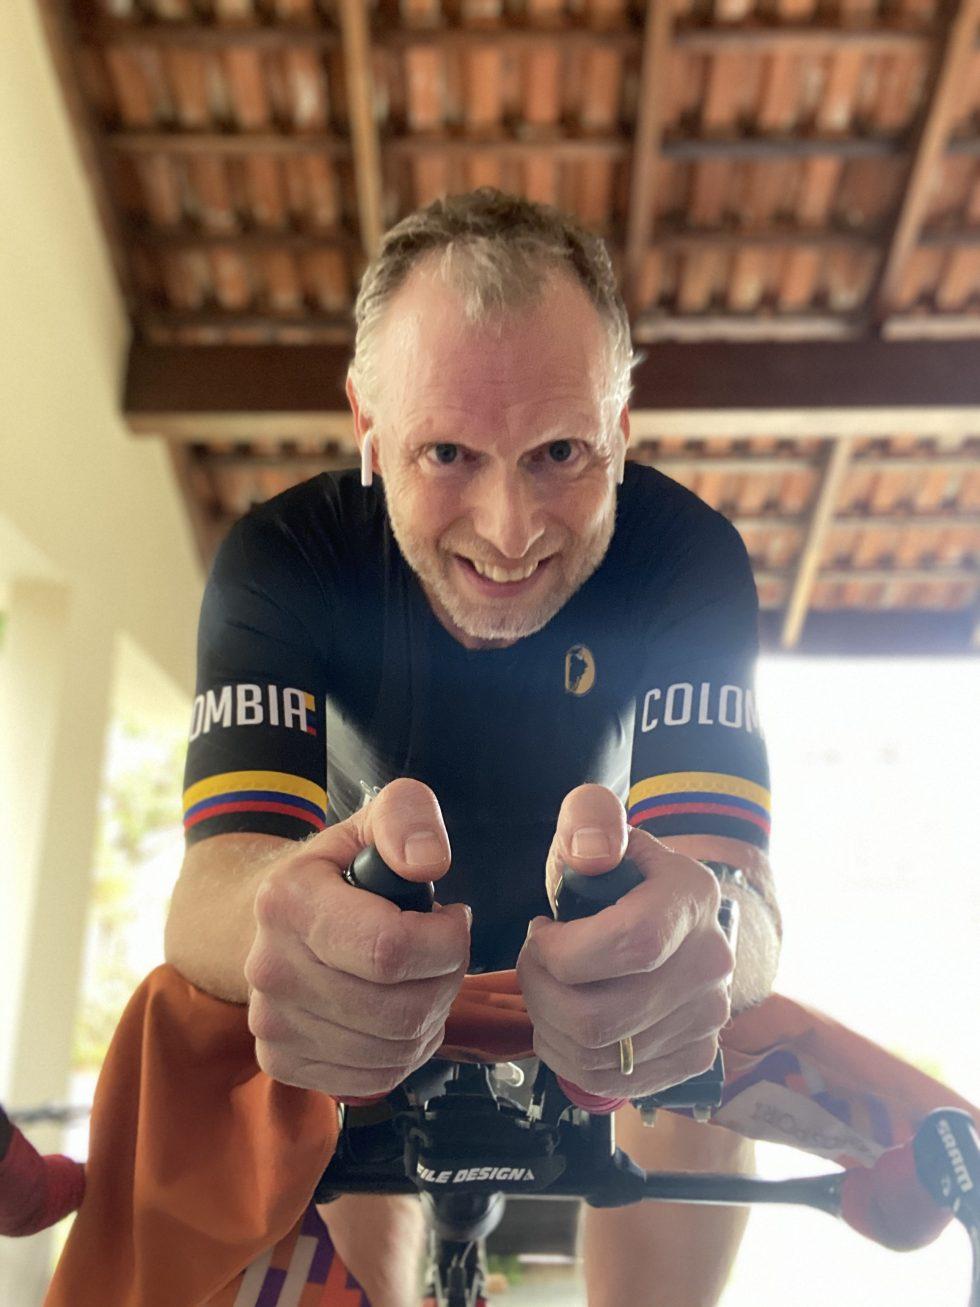 Bike sporttechtips